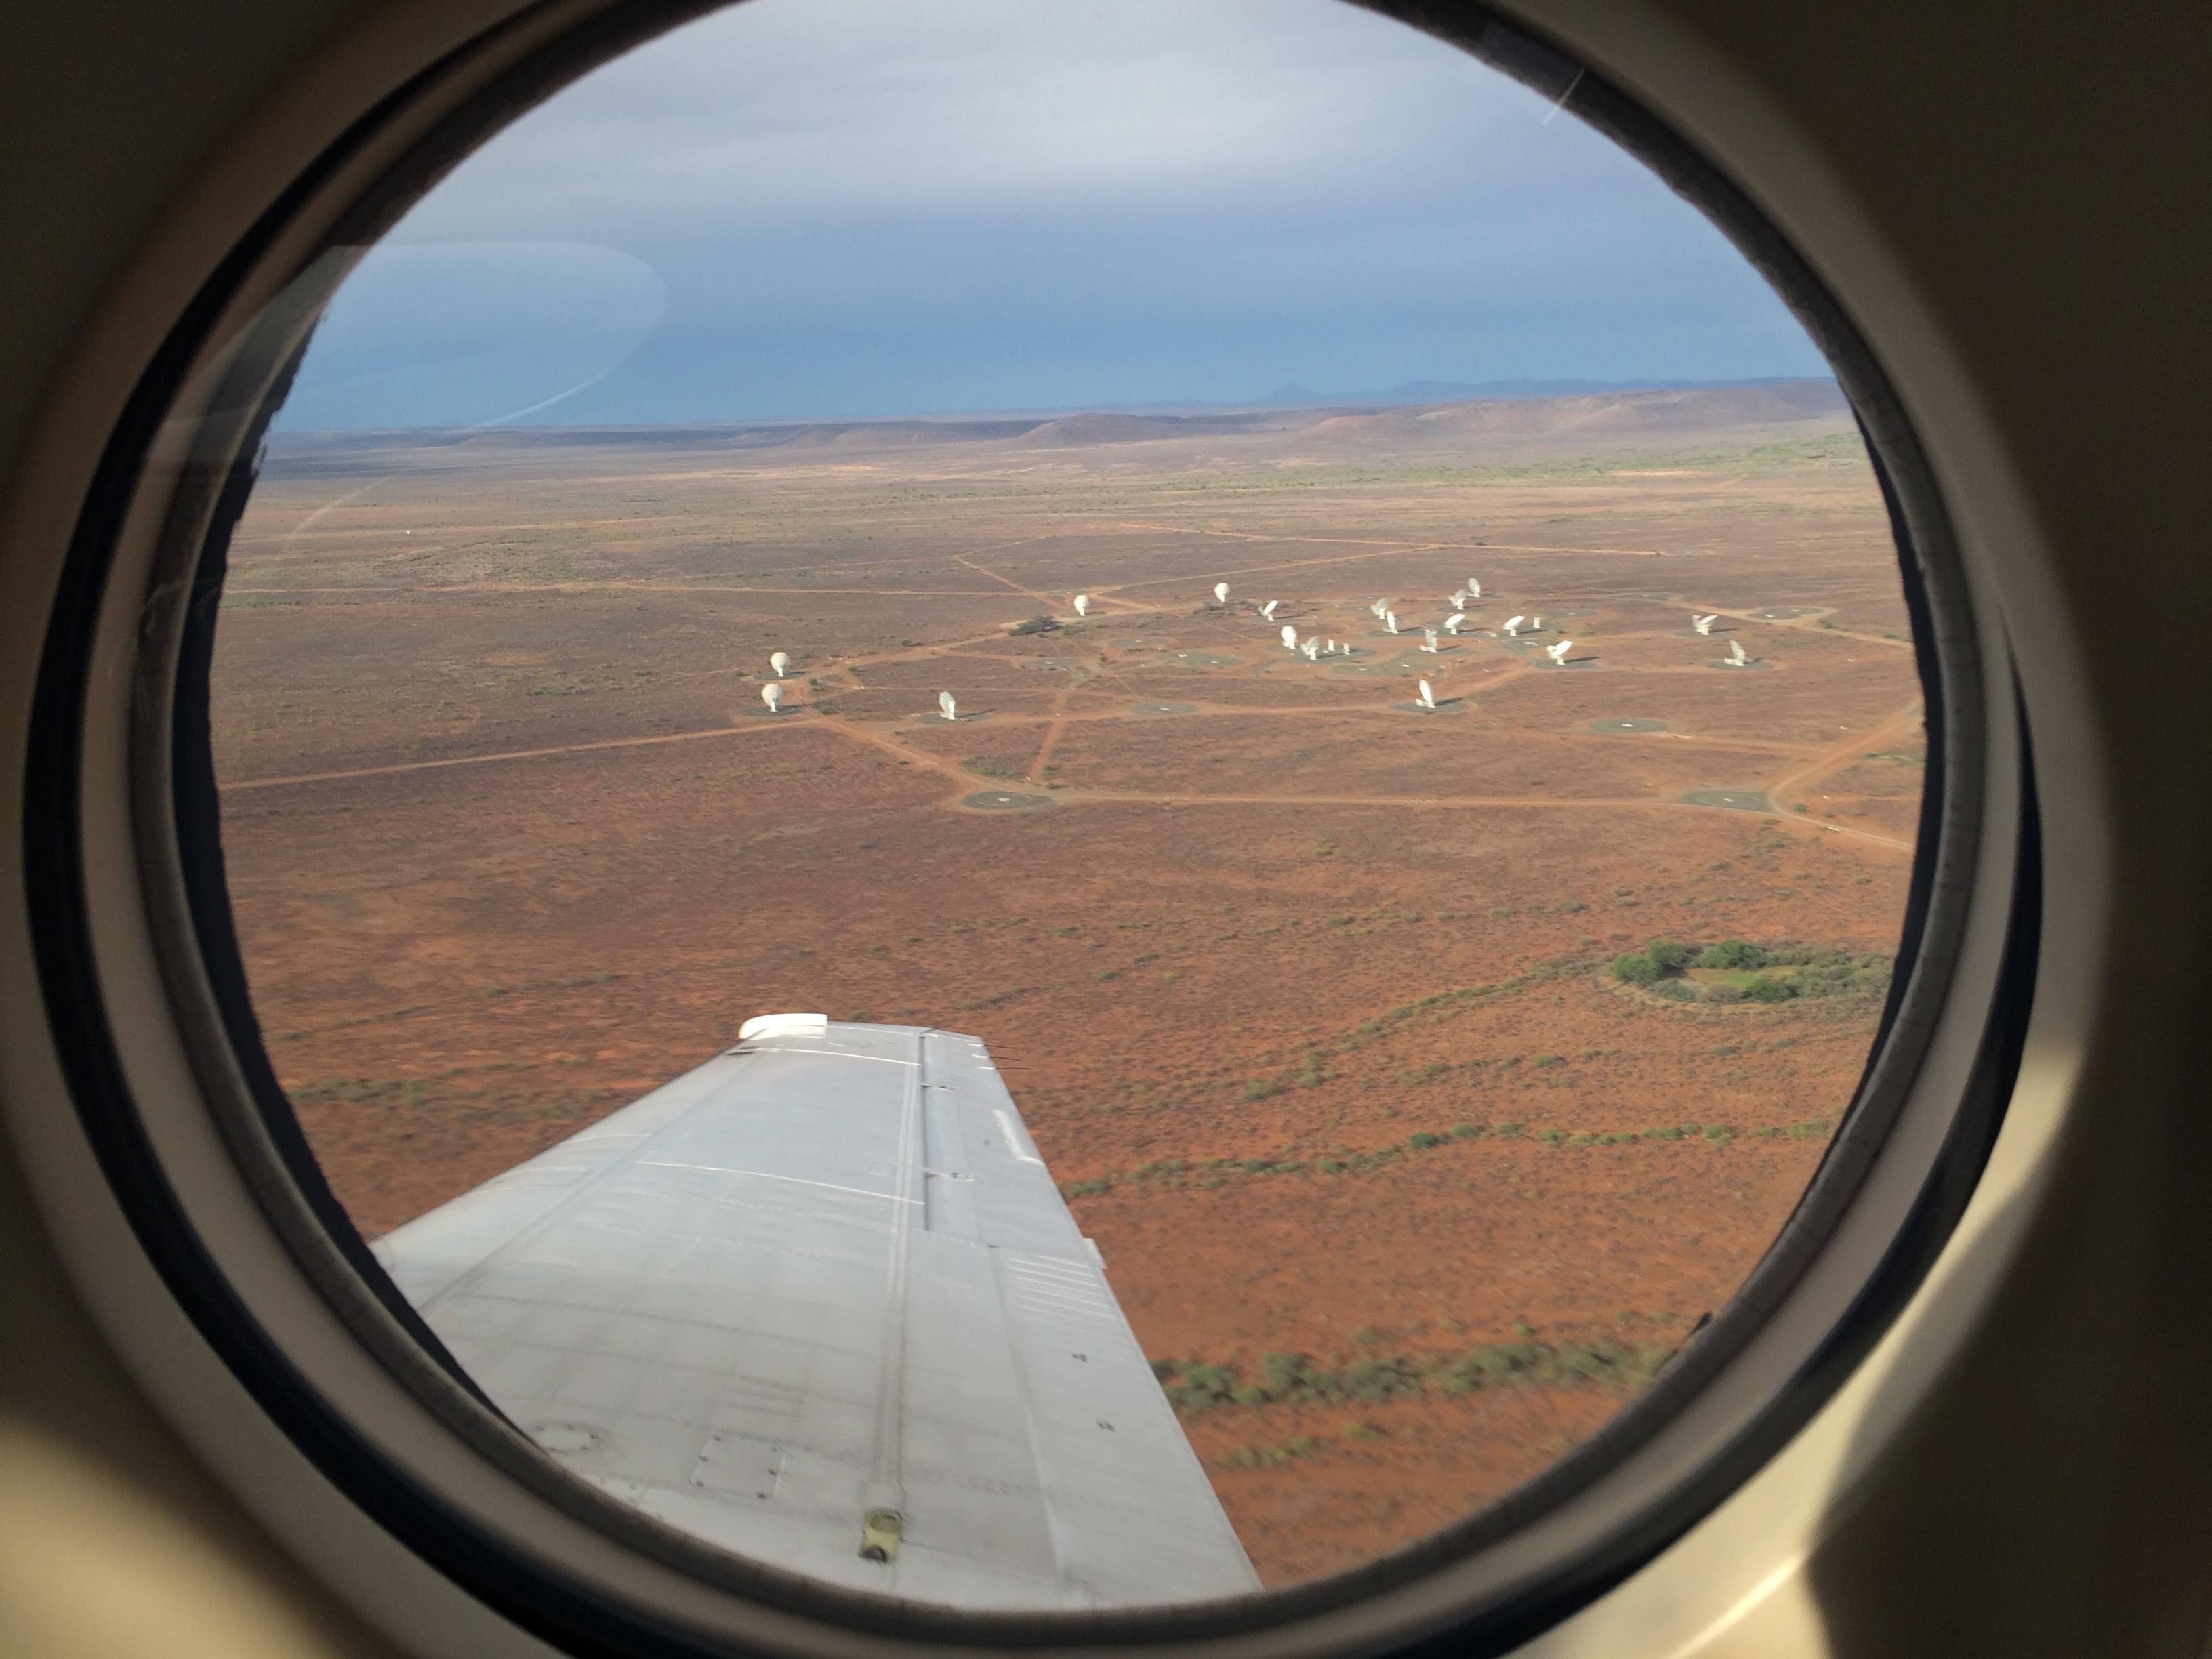 Le 19 antenne MeerKAT attualmente pronte in Sudafrica. Crediti: SKA Sudafrica